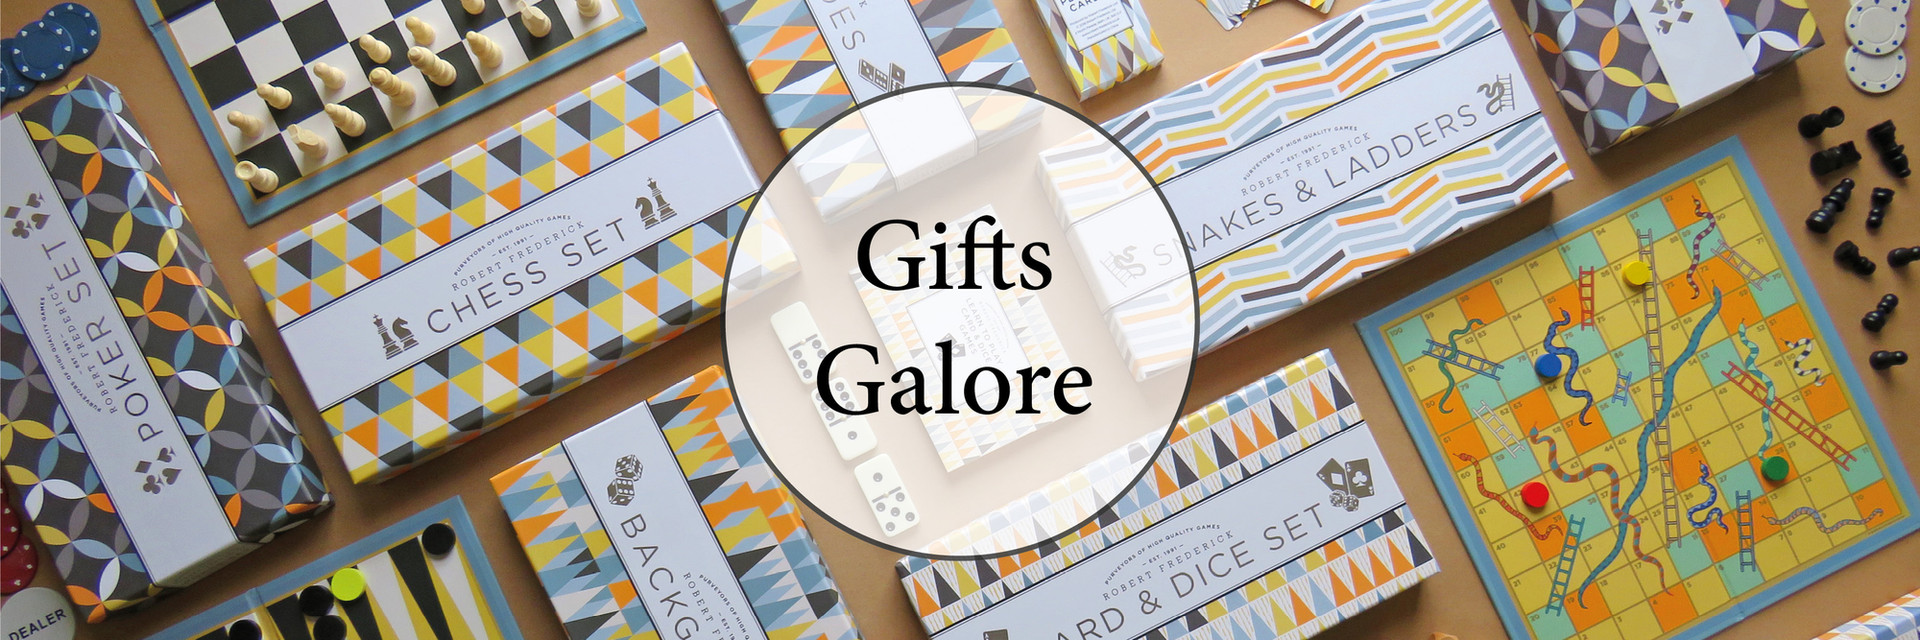 Gifts Galore.jpg